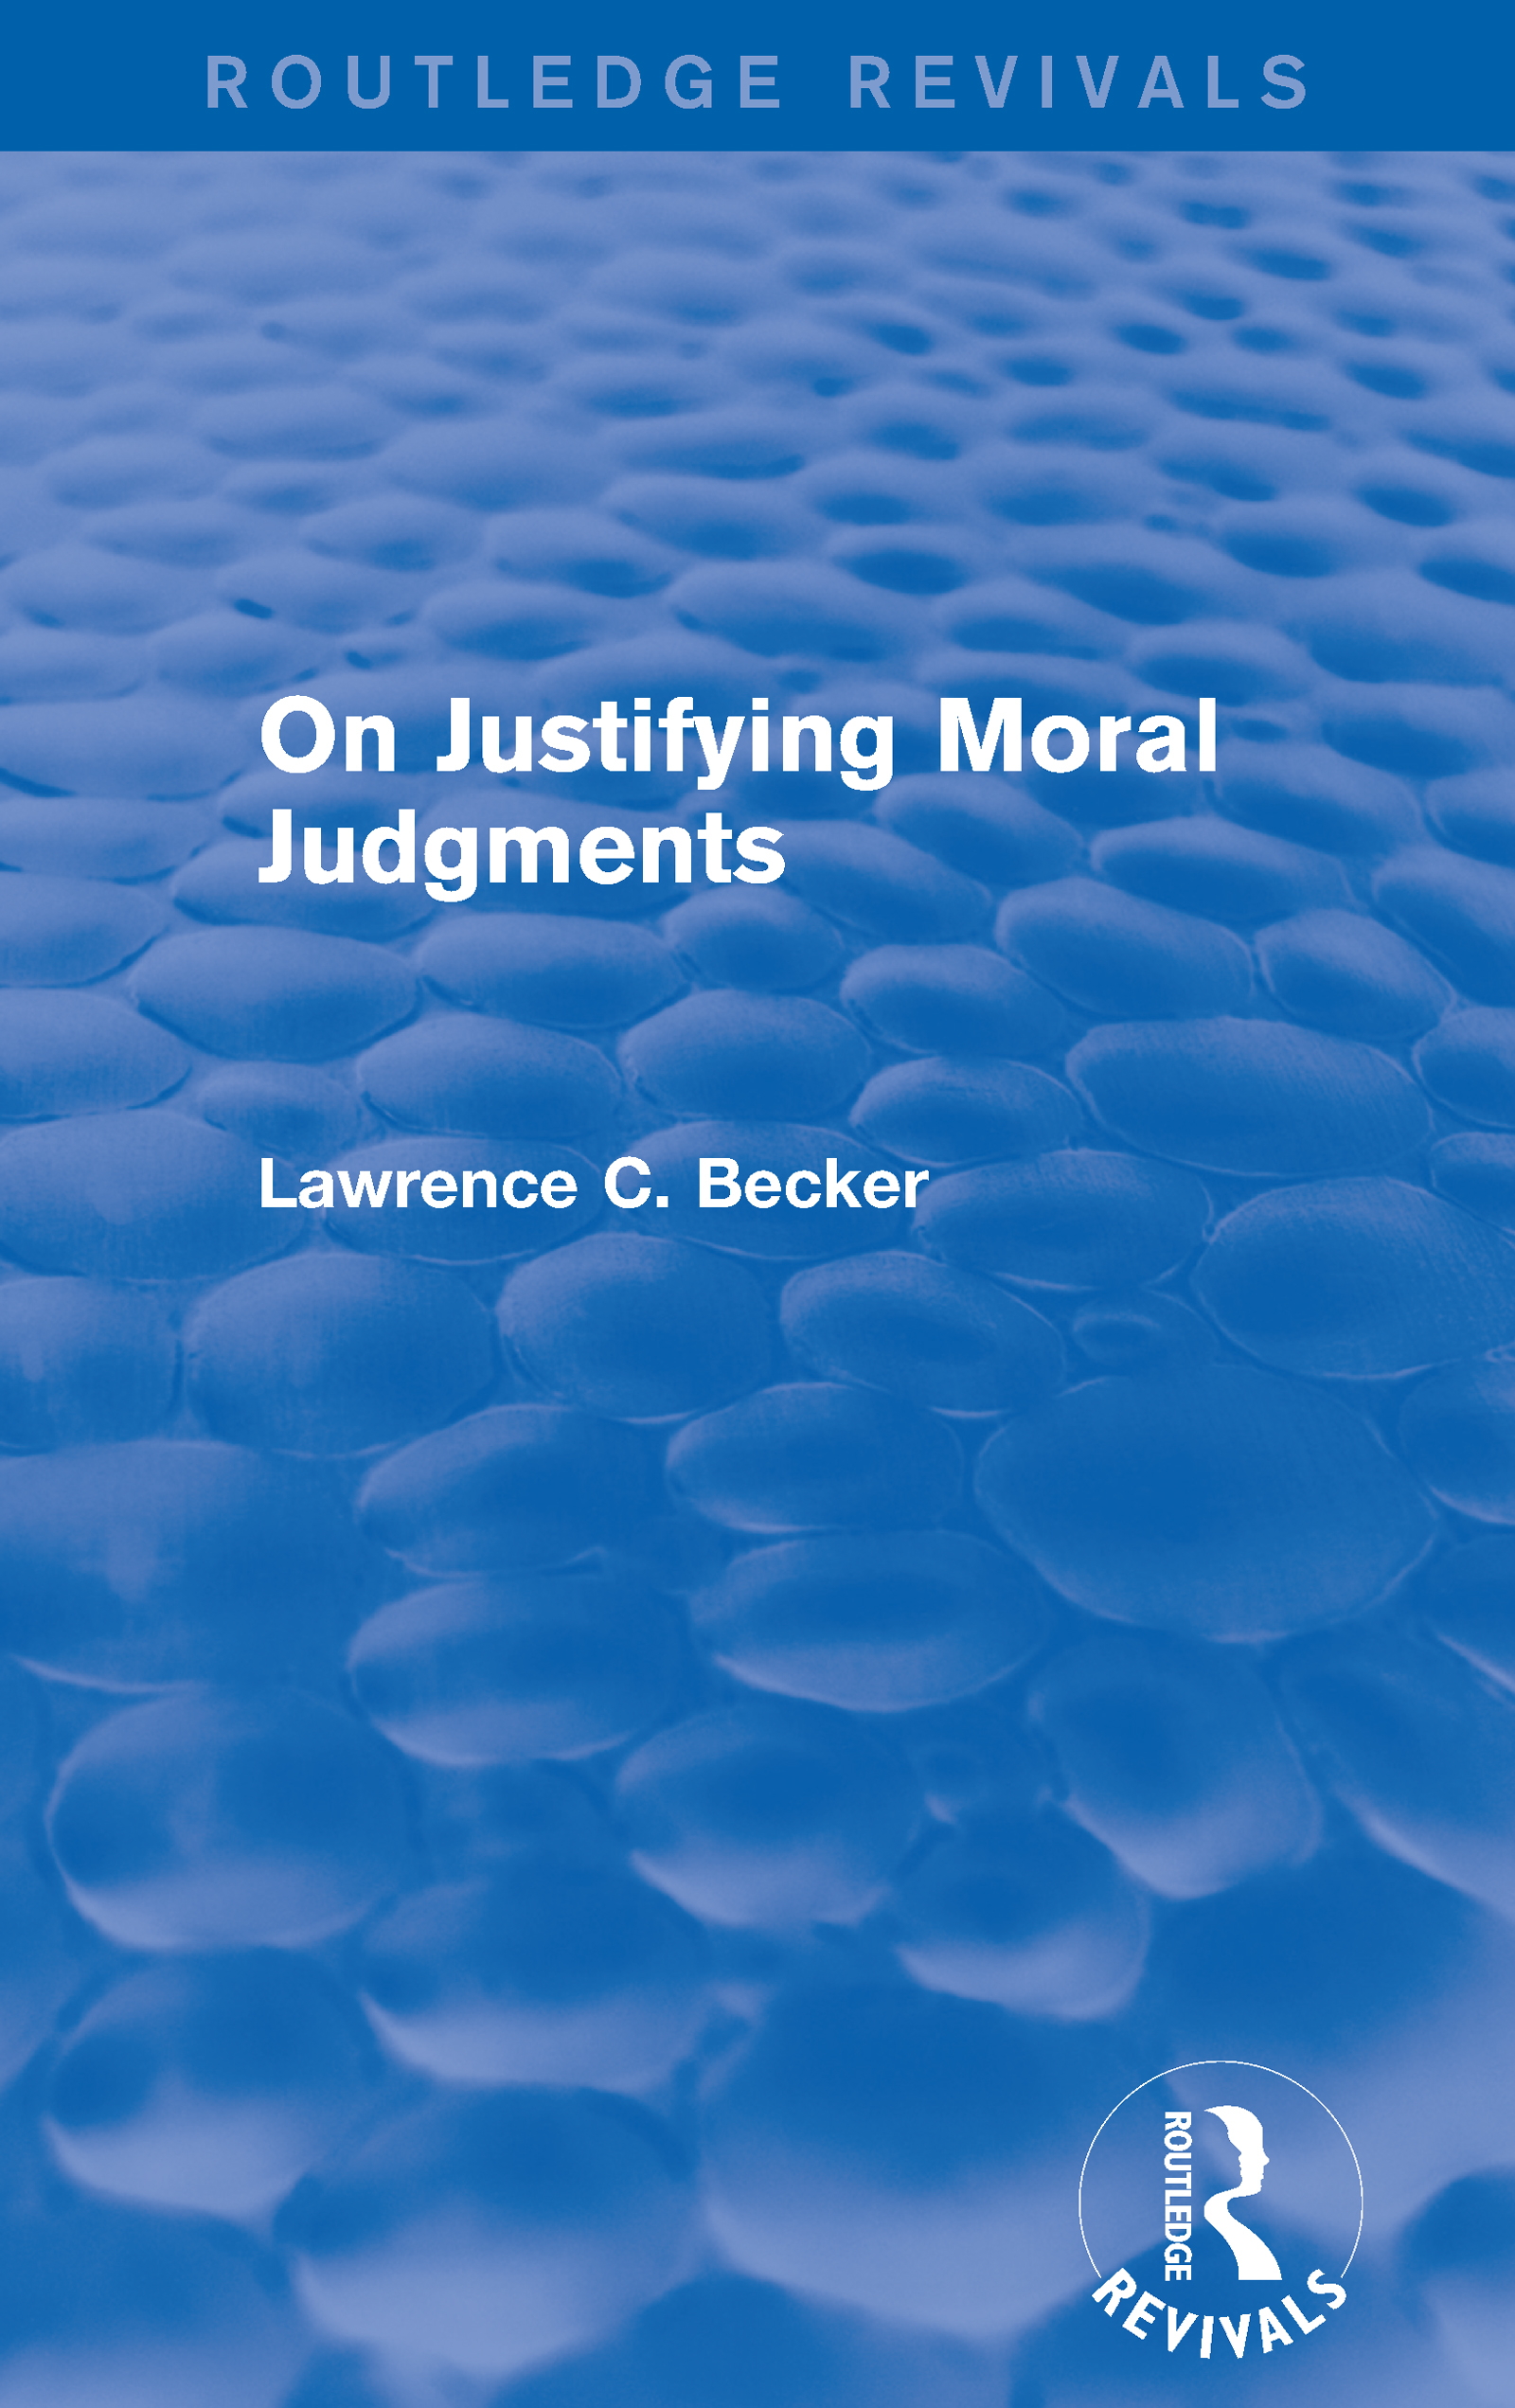 On Justifying Moral Judgements (Routledge Revivals)